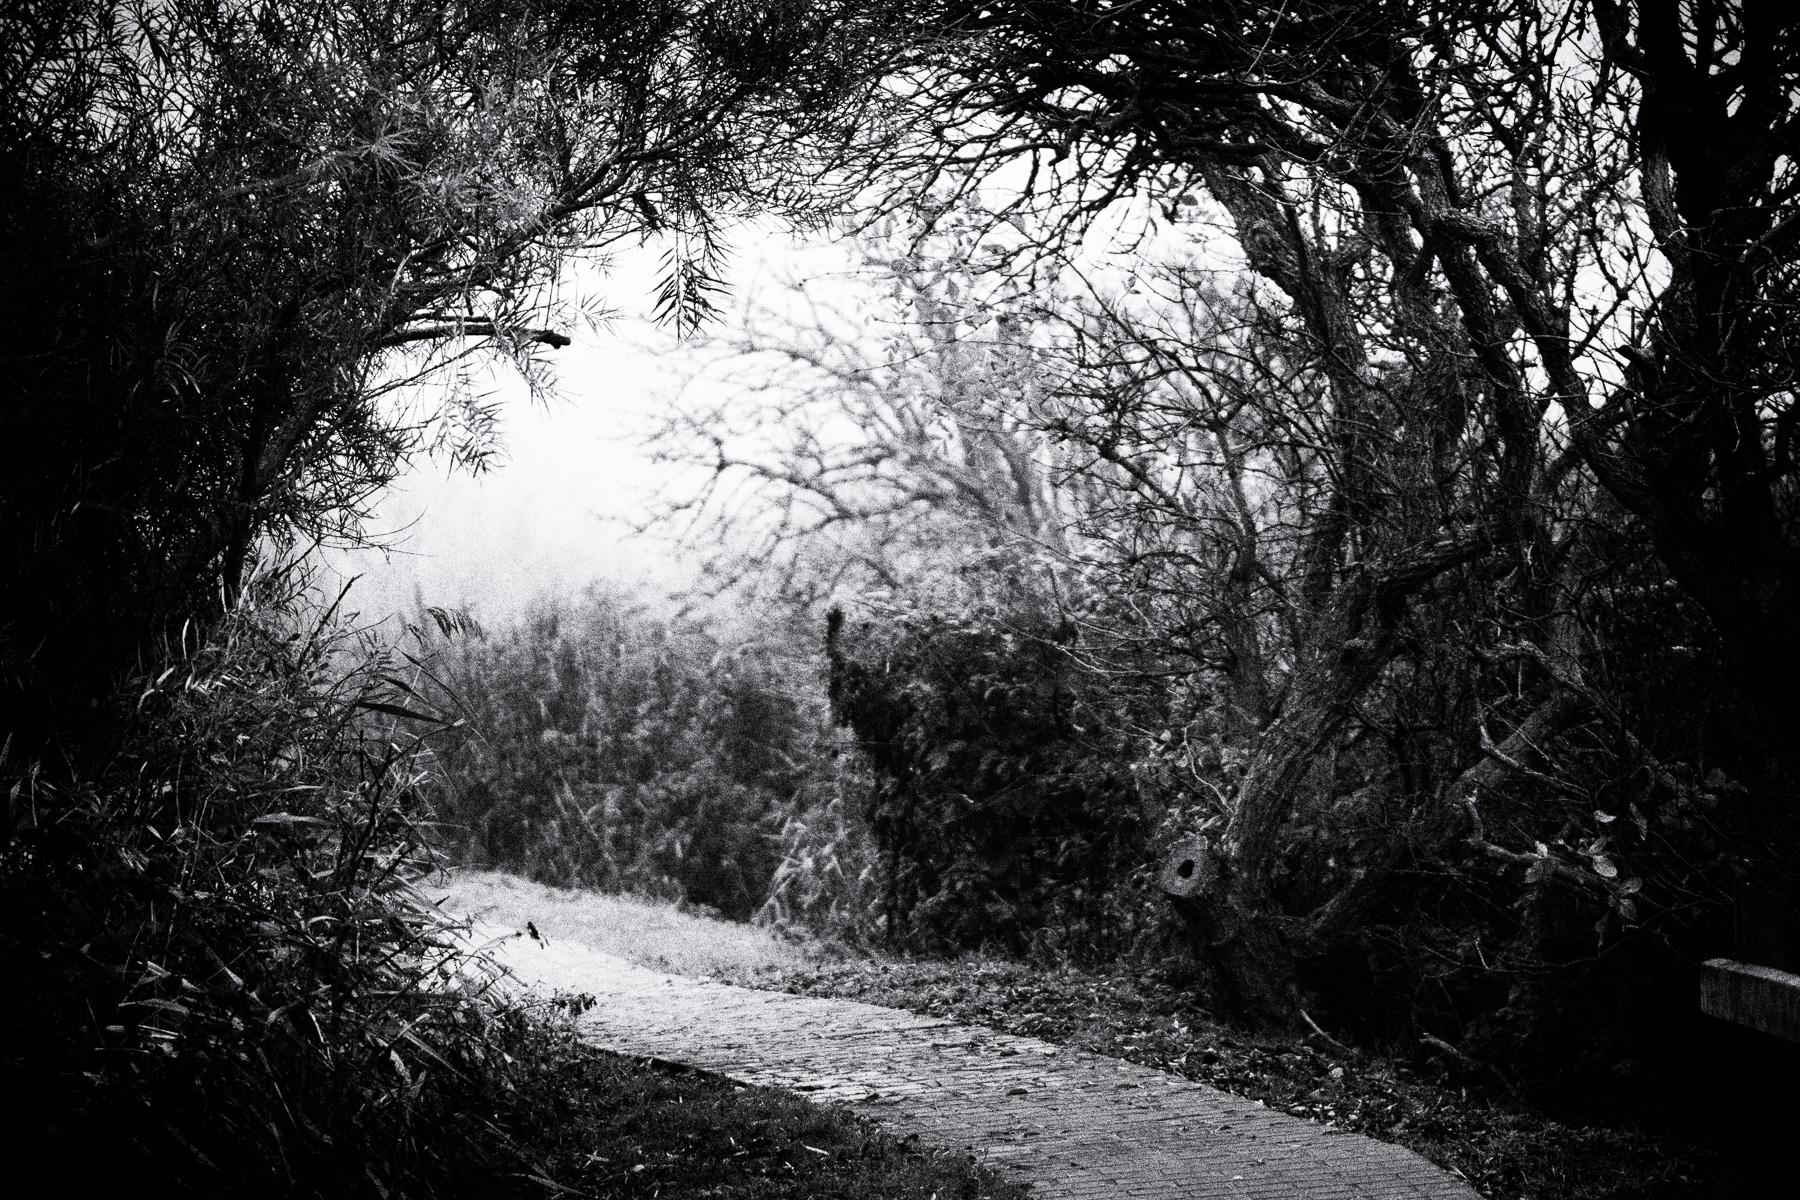 zugang zum hexenwald, borkum im nebel